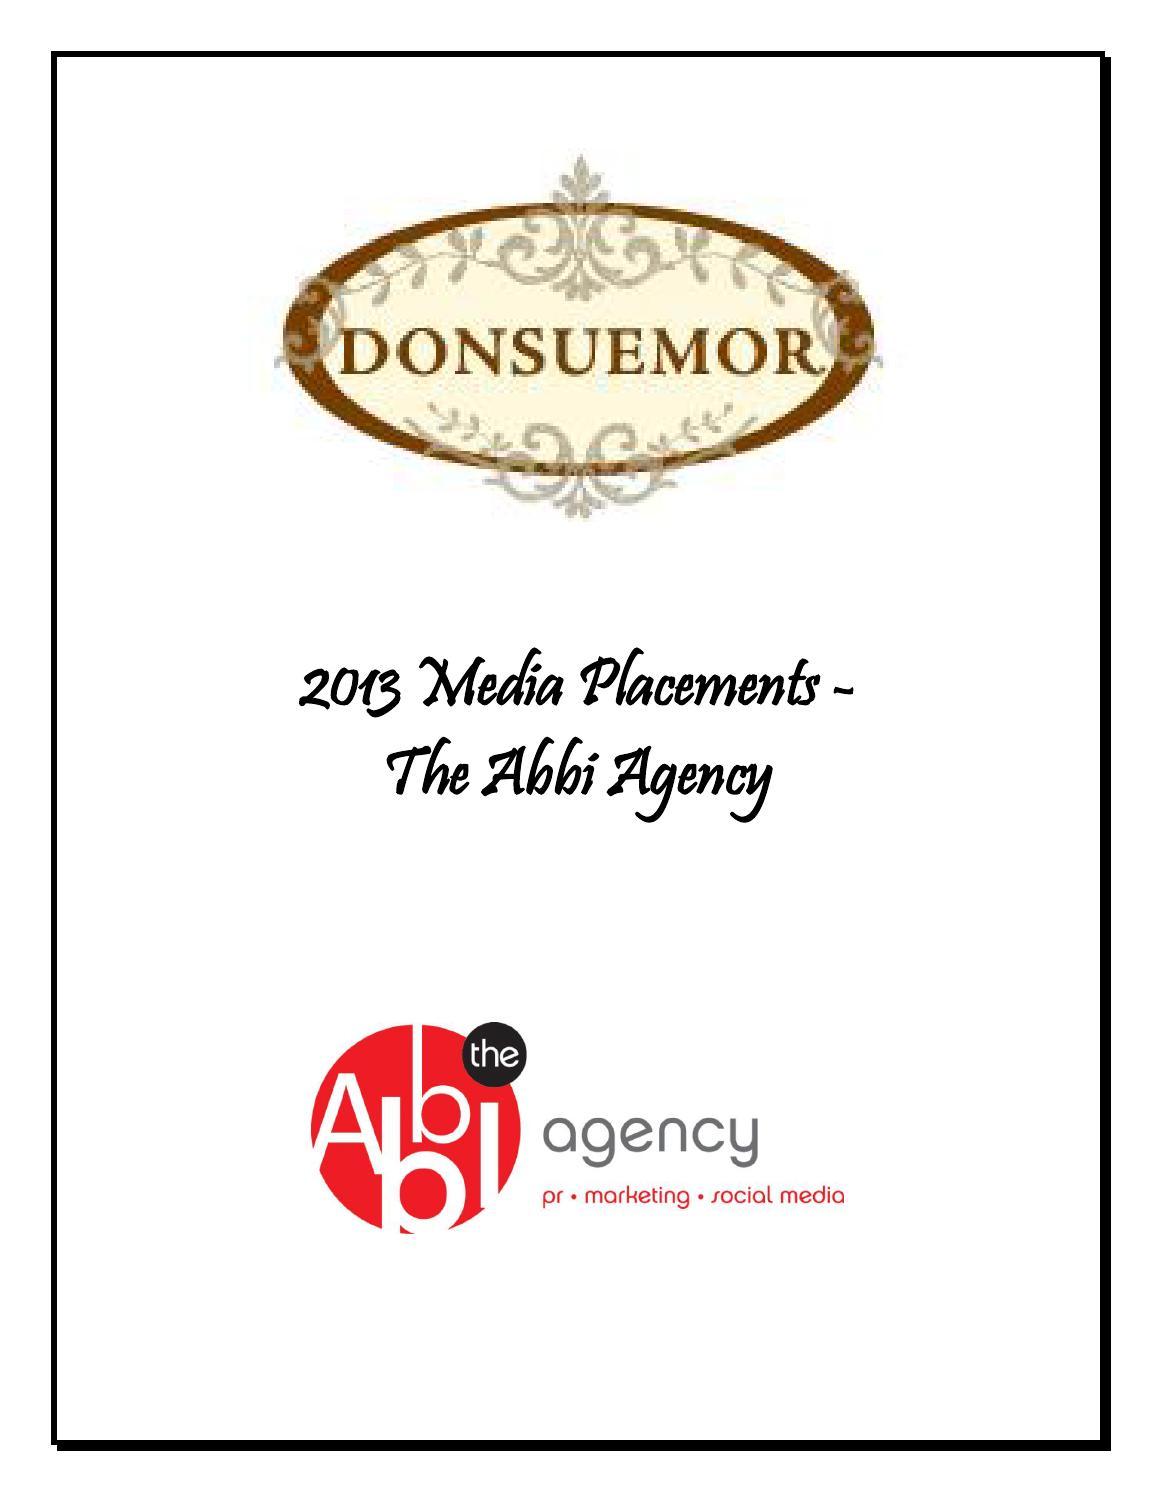 2013 Donsuemor Media Placements